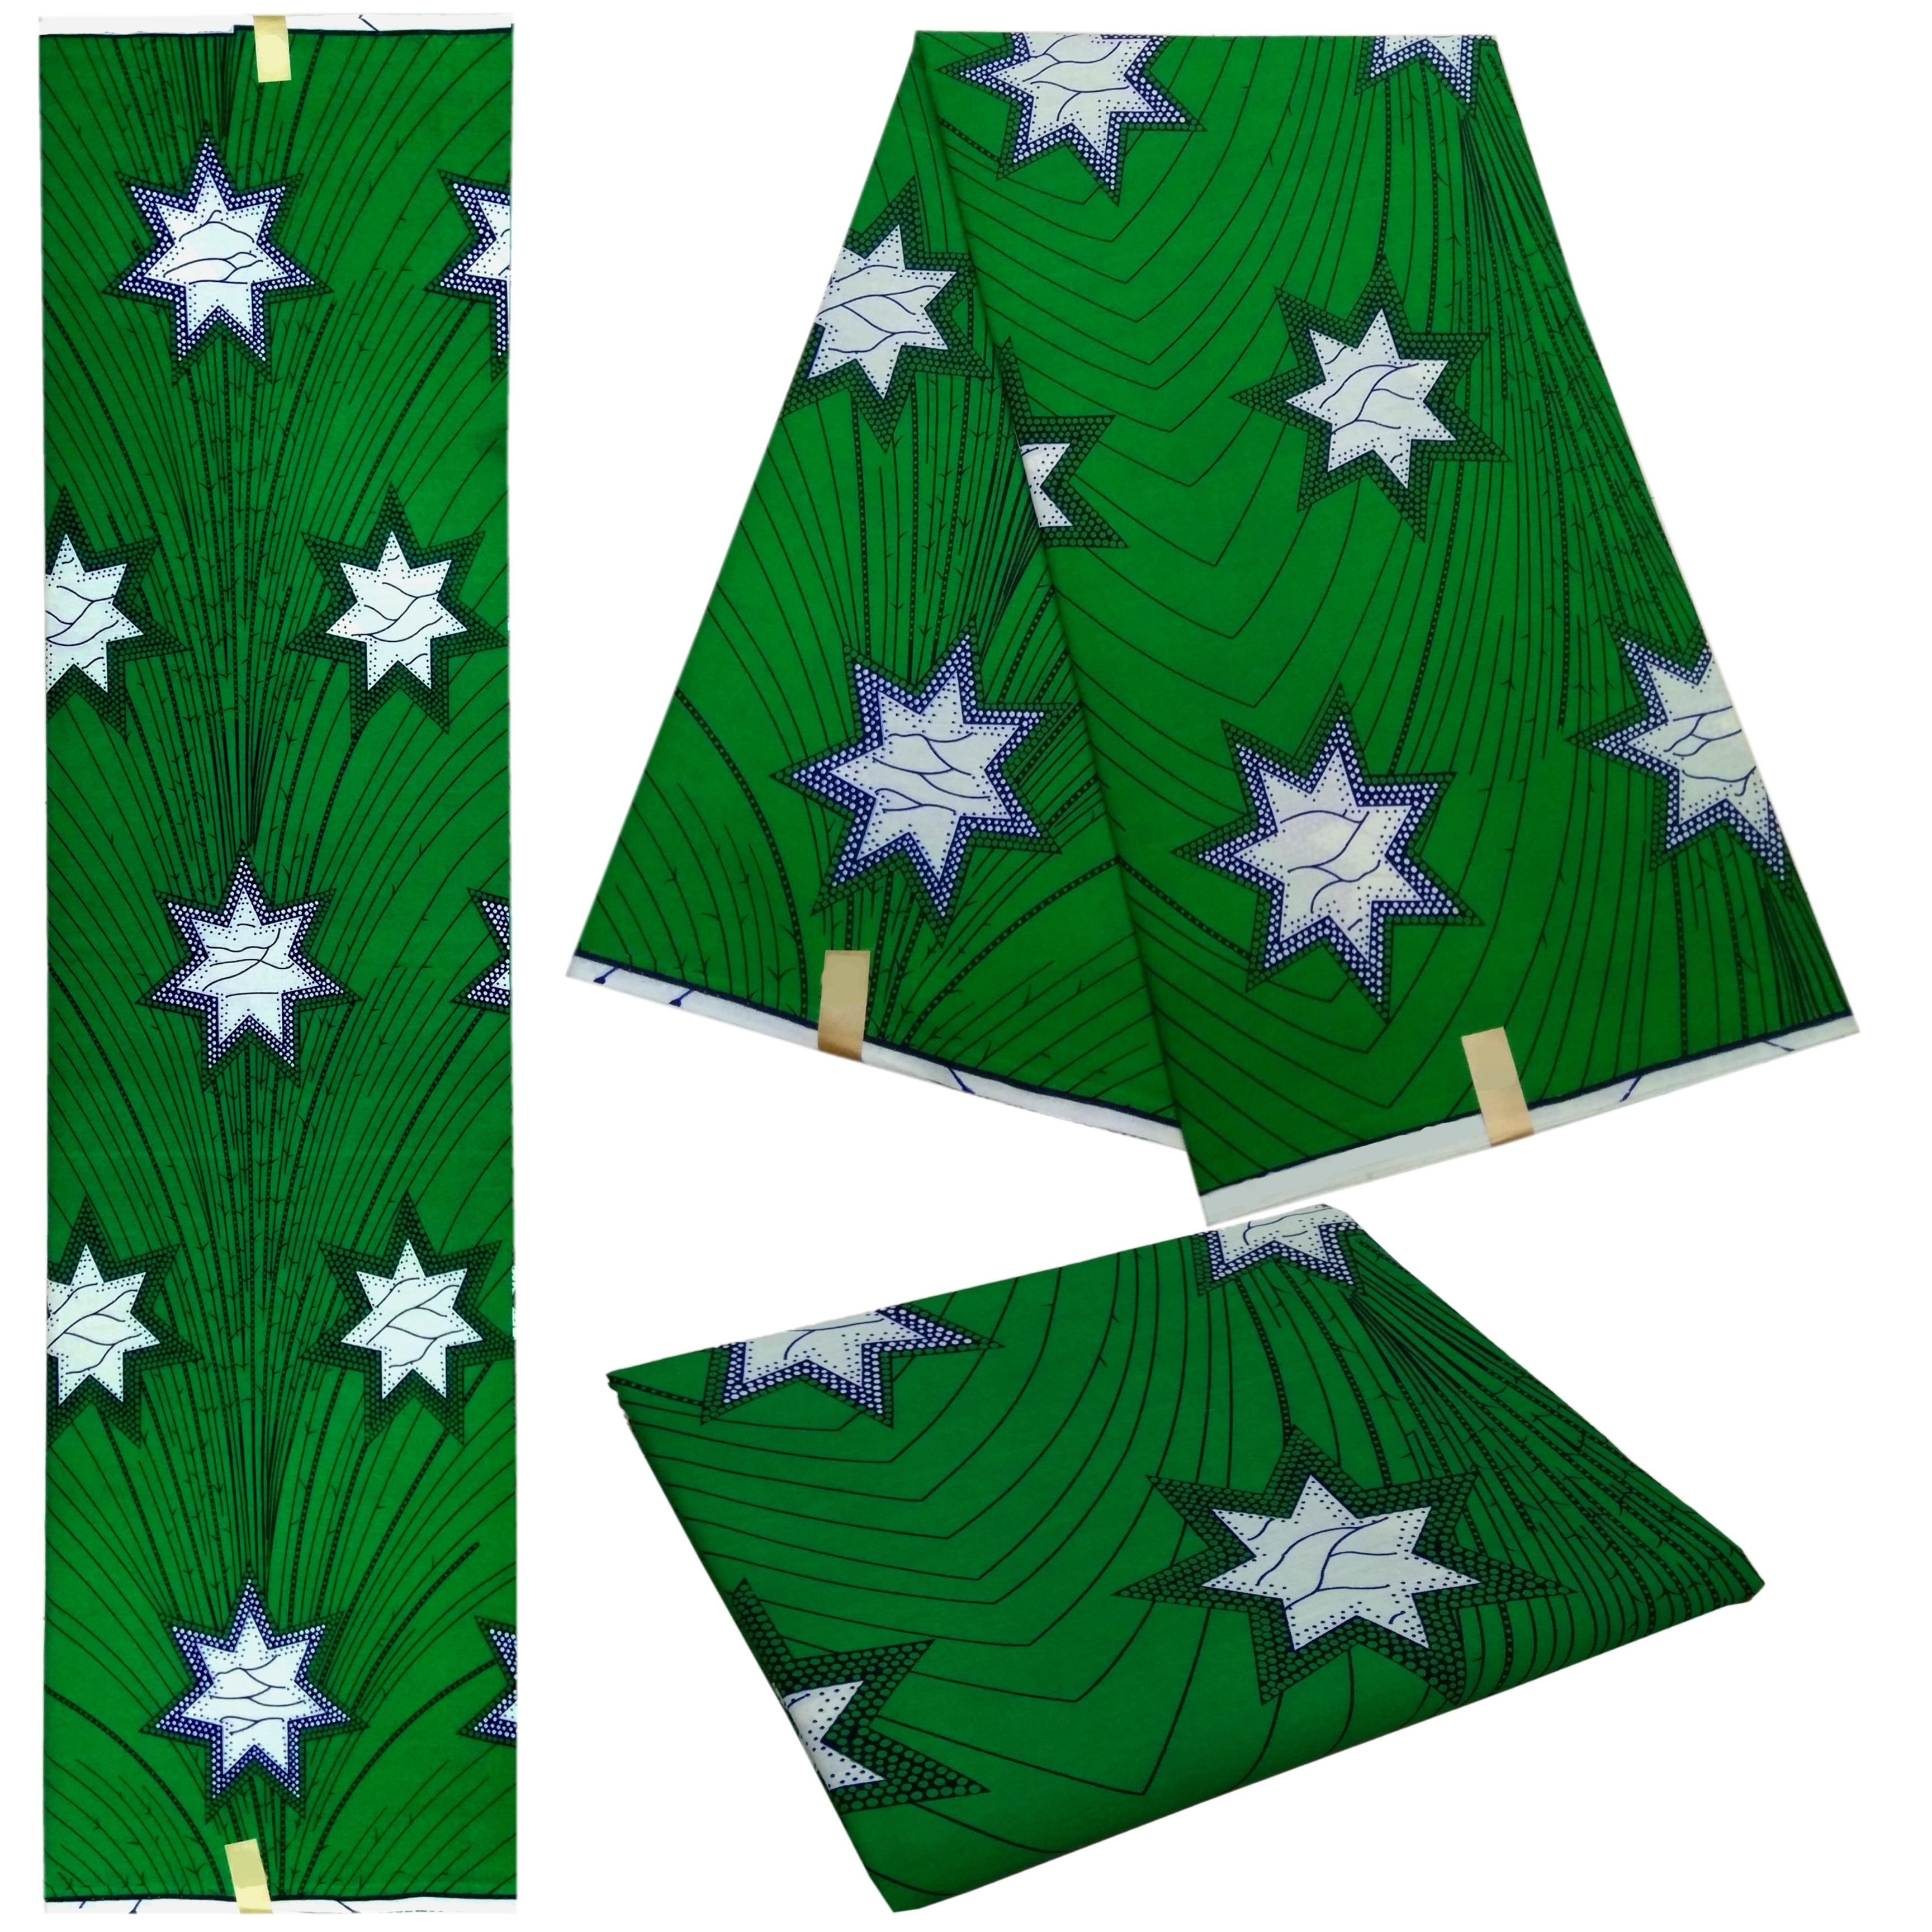 LIULANZHI african wax fabrics multicolor prints cotton batik fabric for women dress Hot sale ankara real wax fabric XDR87 XDR100 in Fabric from Home Garden